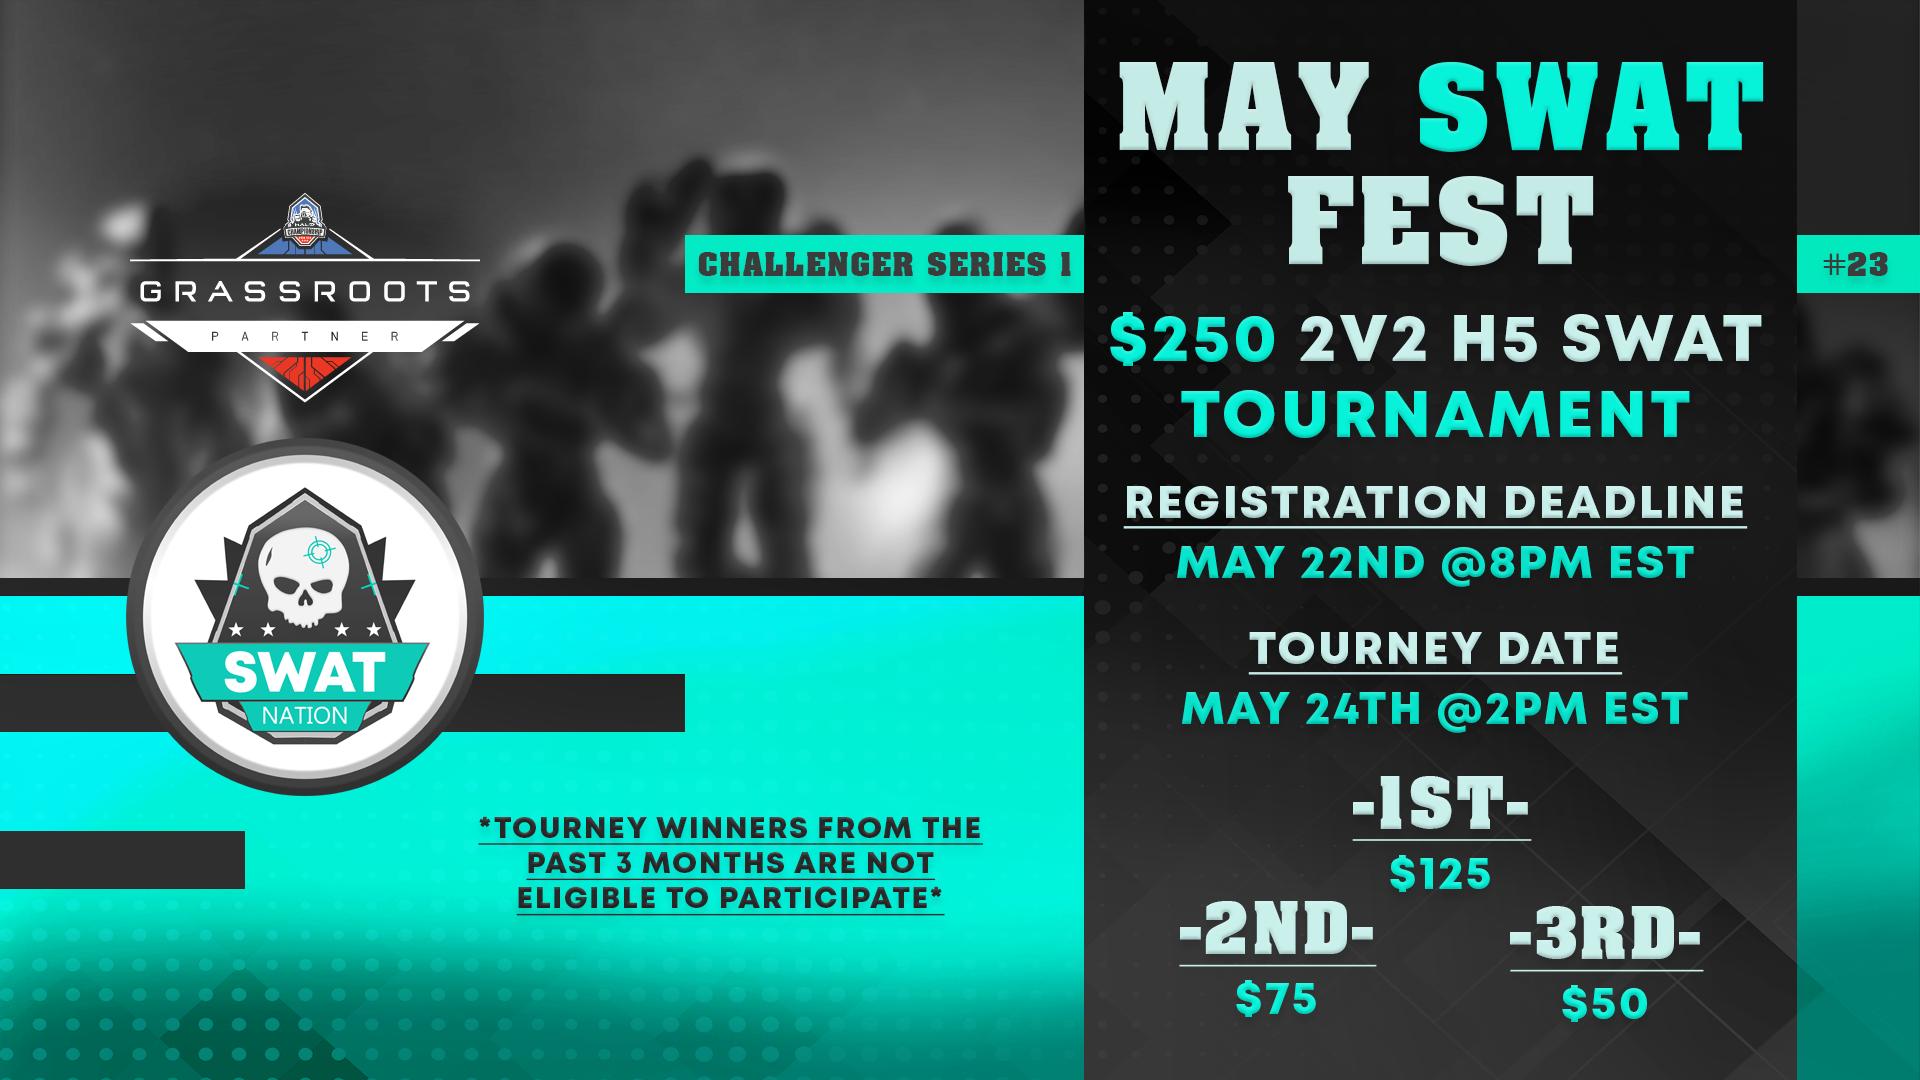 #23 May SWAT Fest